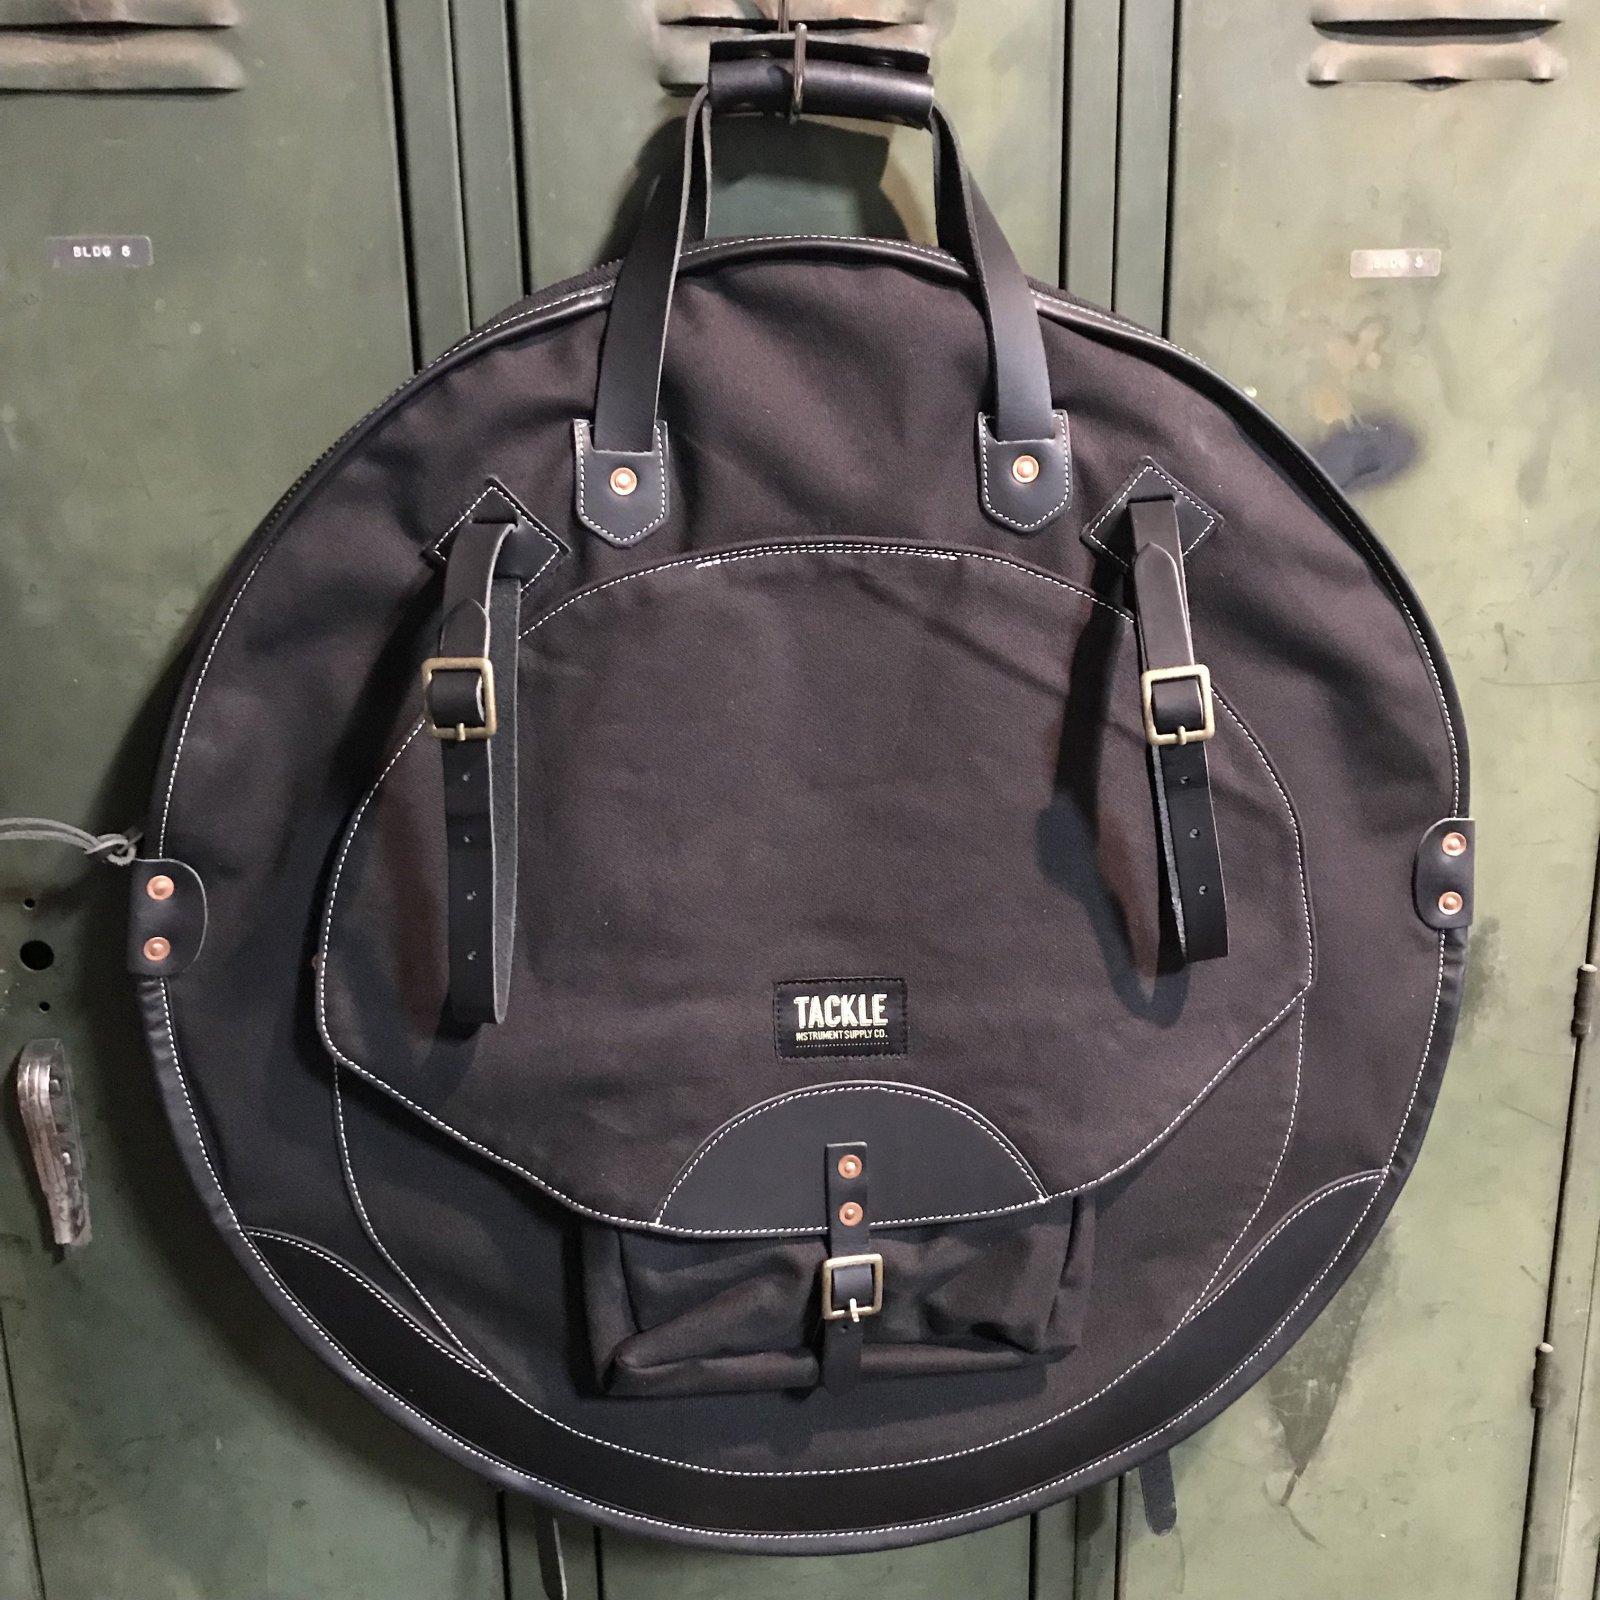 Tackle 22 Cymbal Bag